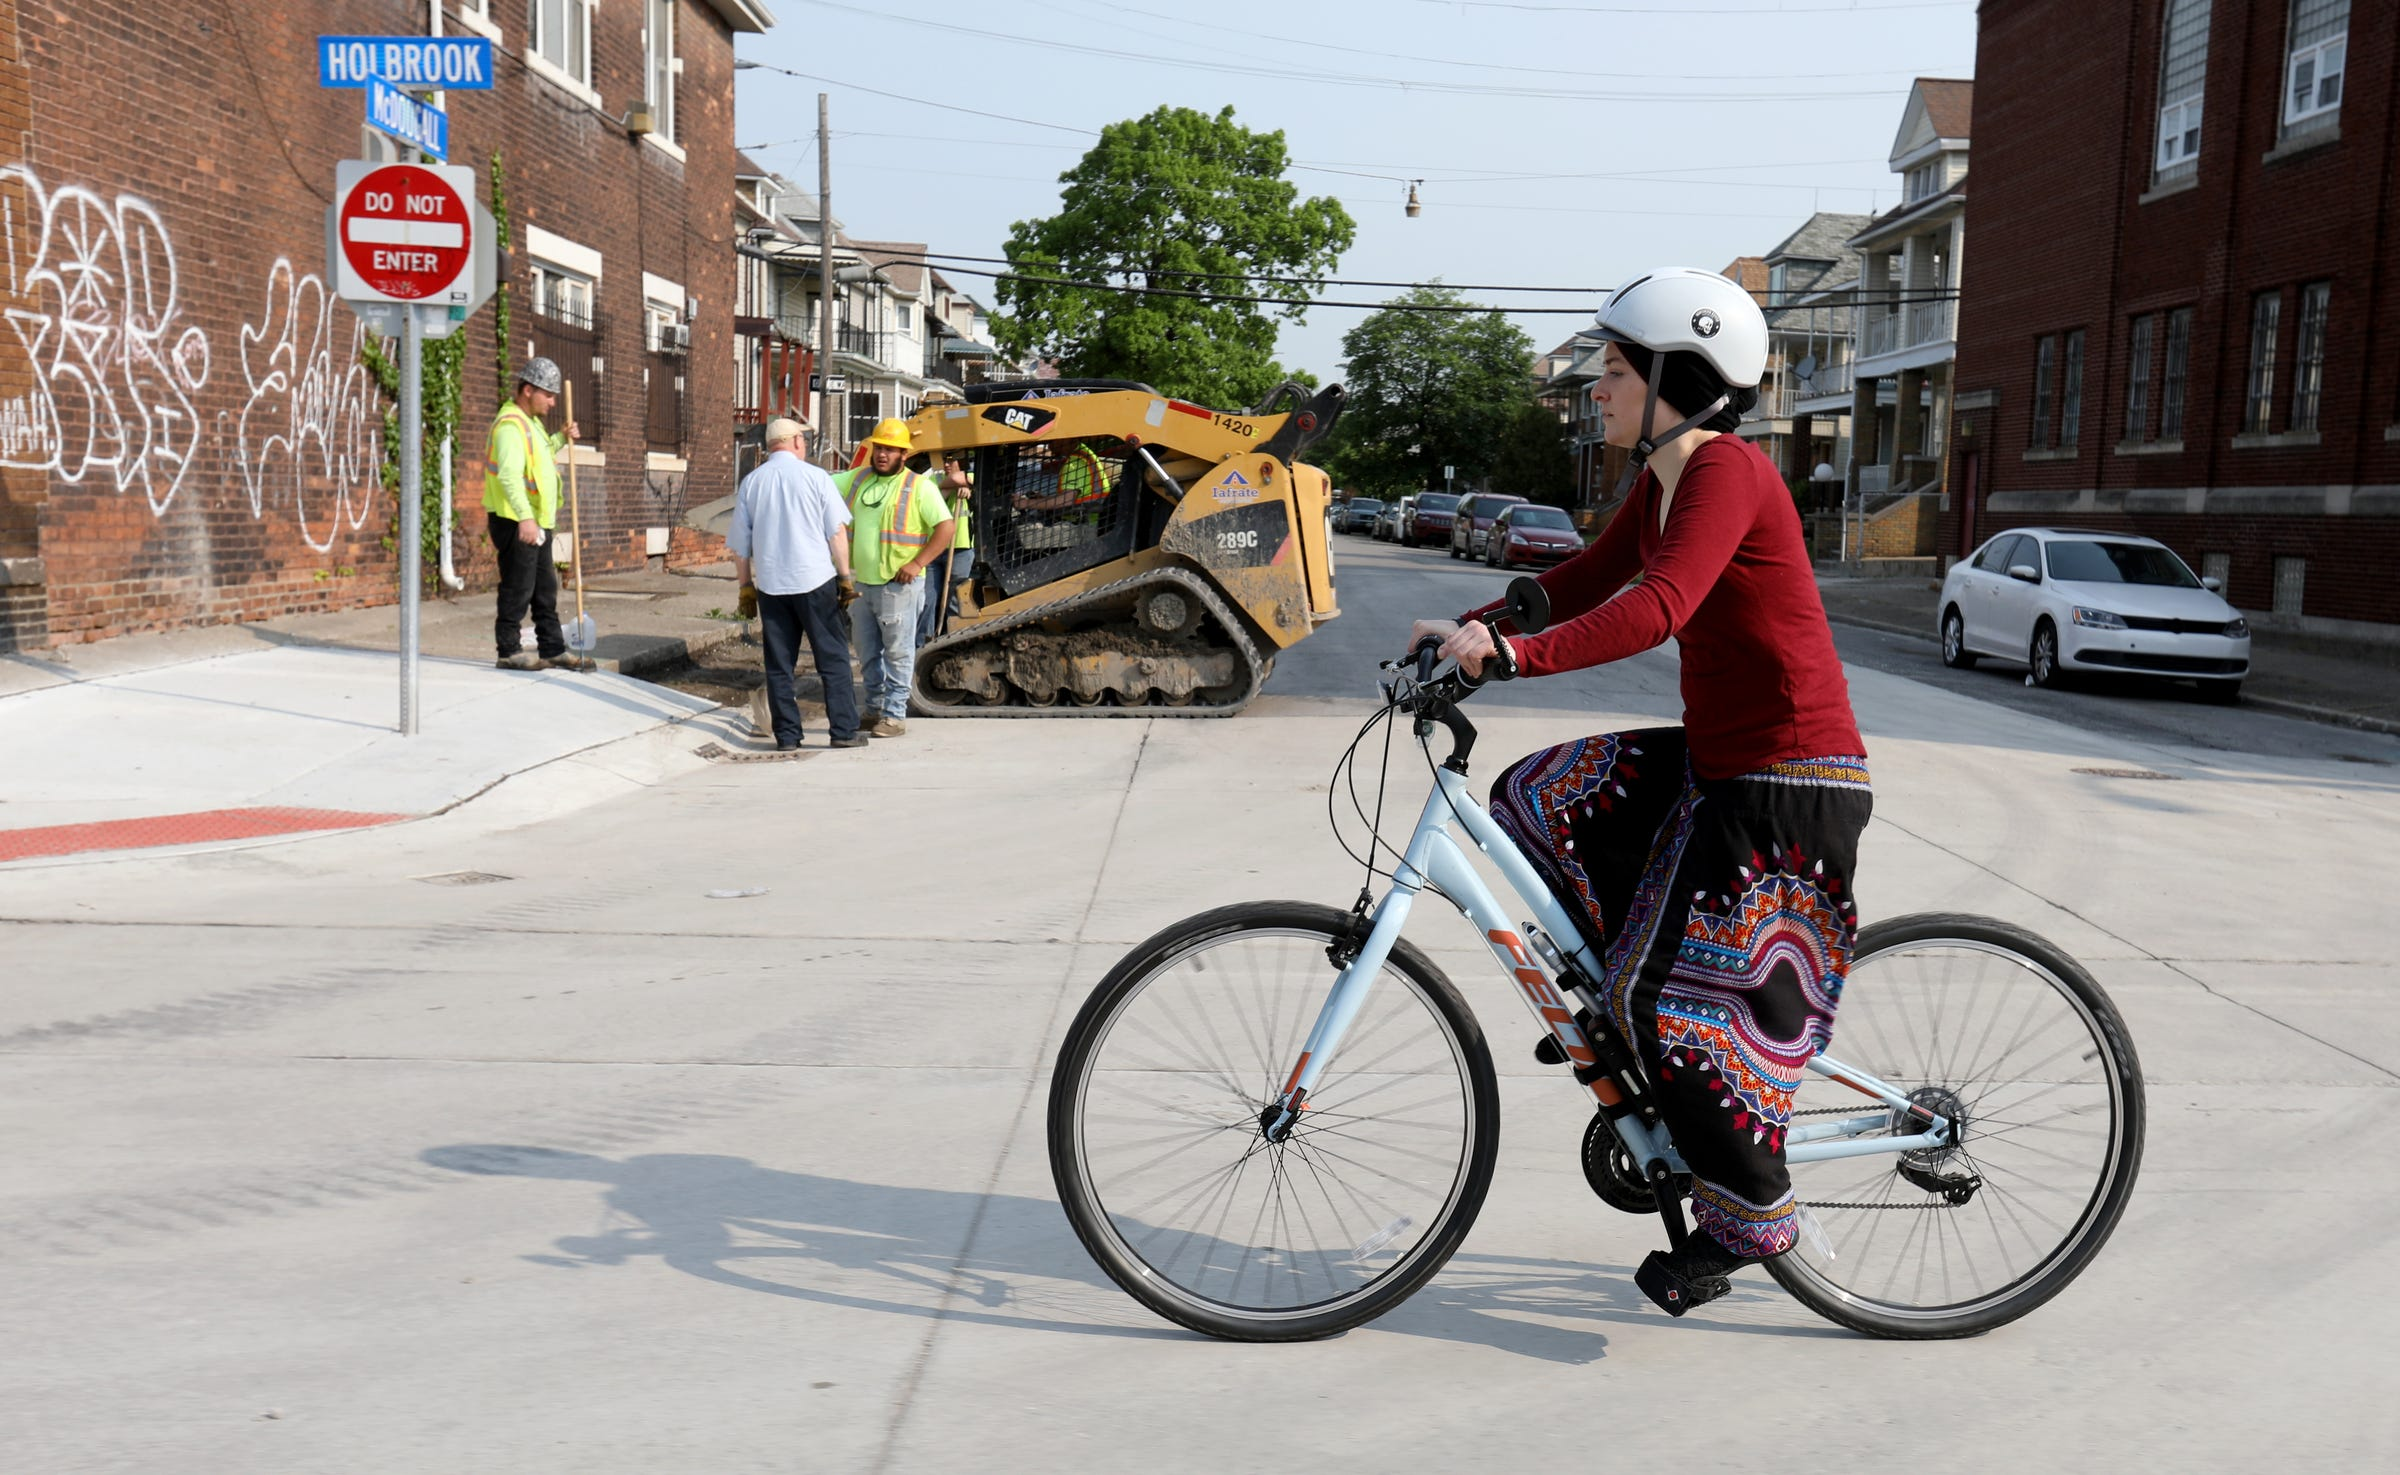 Autos vs  bikes: Watch for shrinking roads in metro Detroit